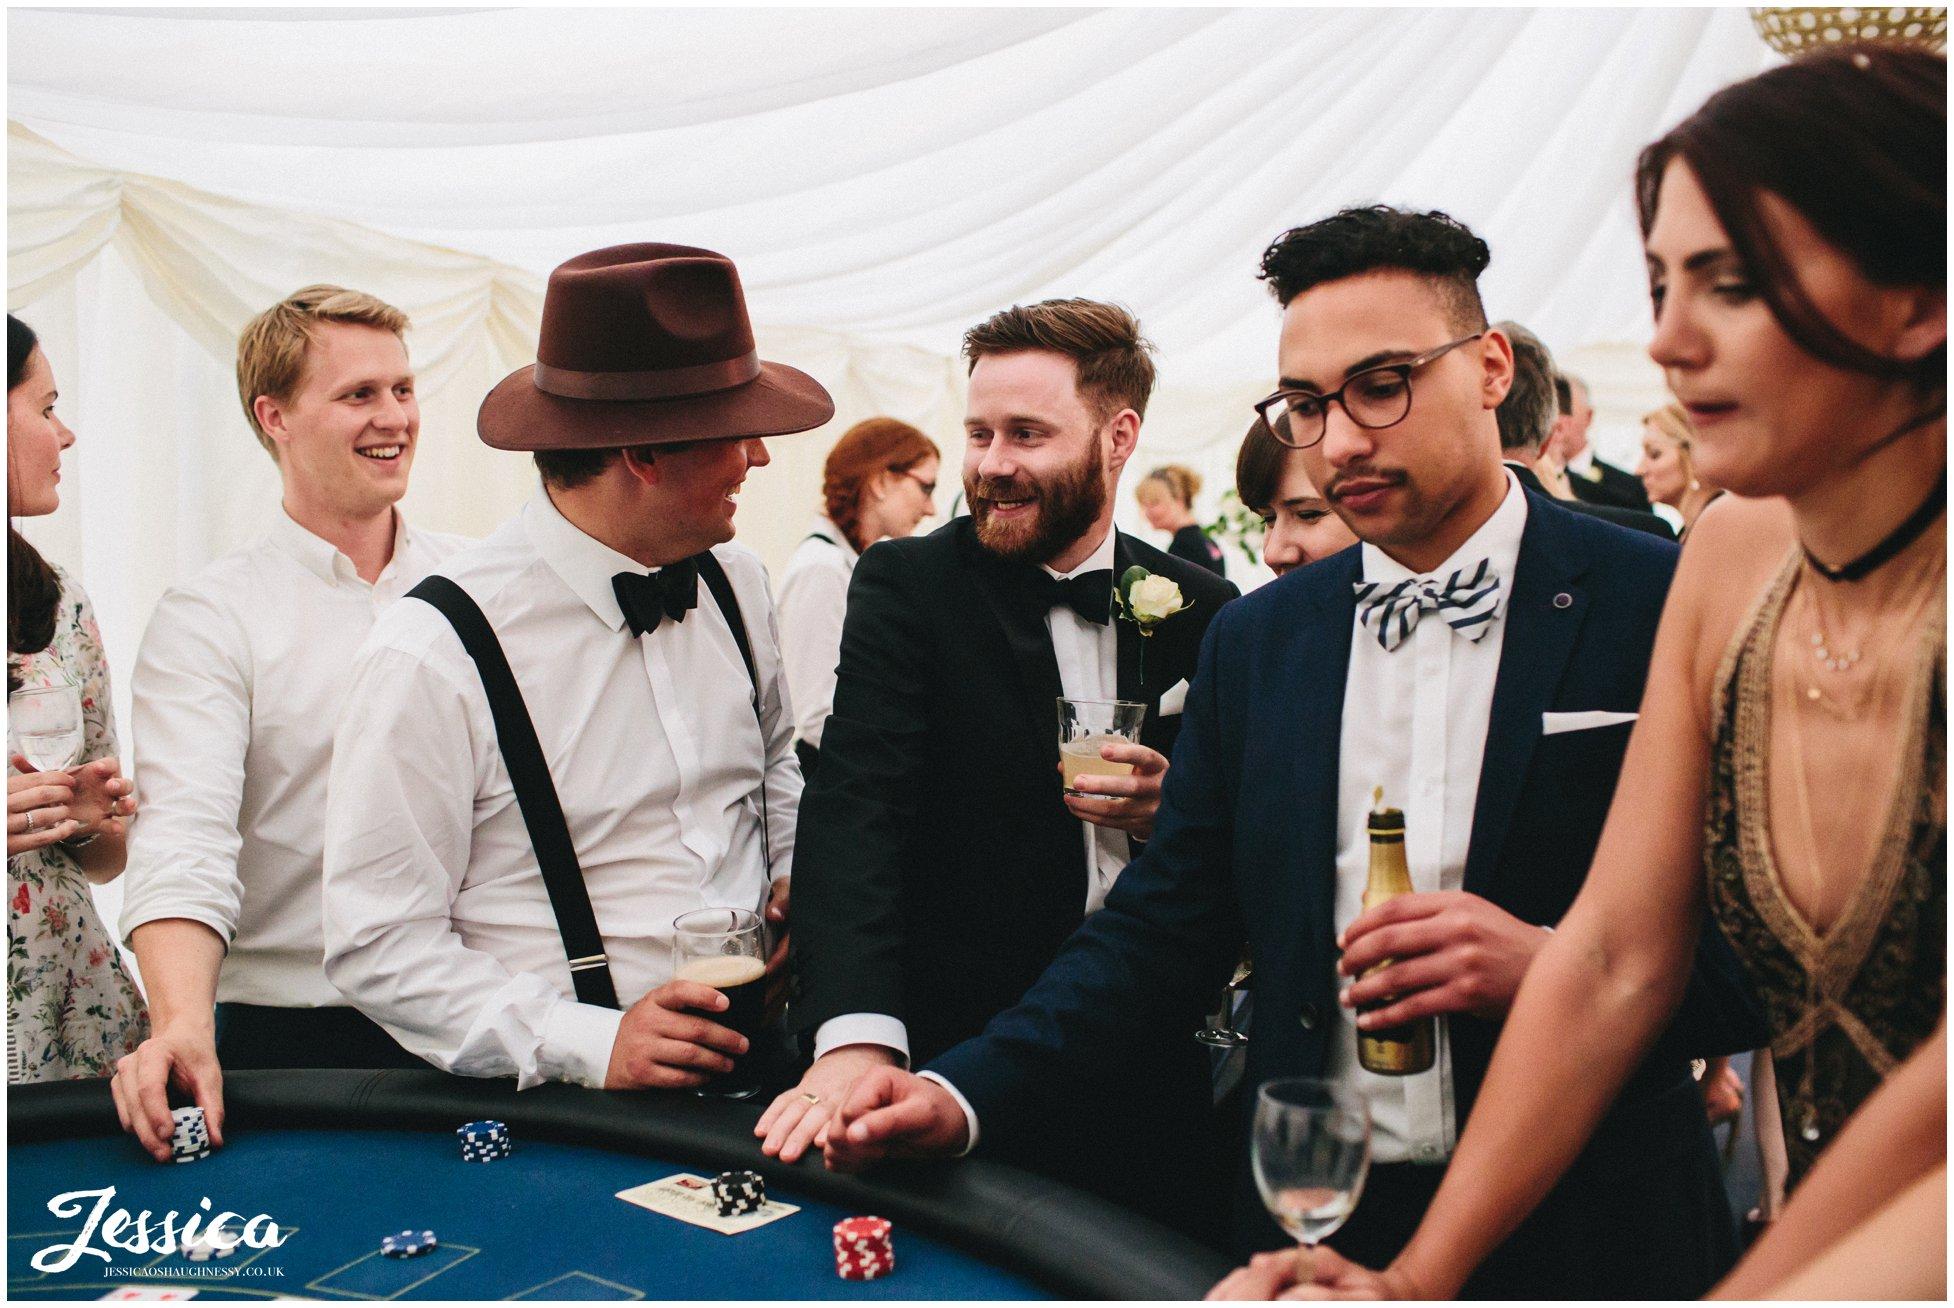 wedding guests gambling in the casino